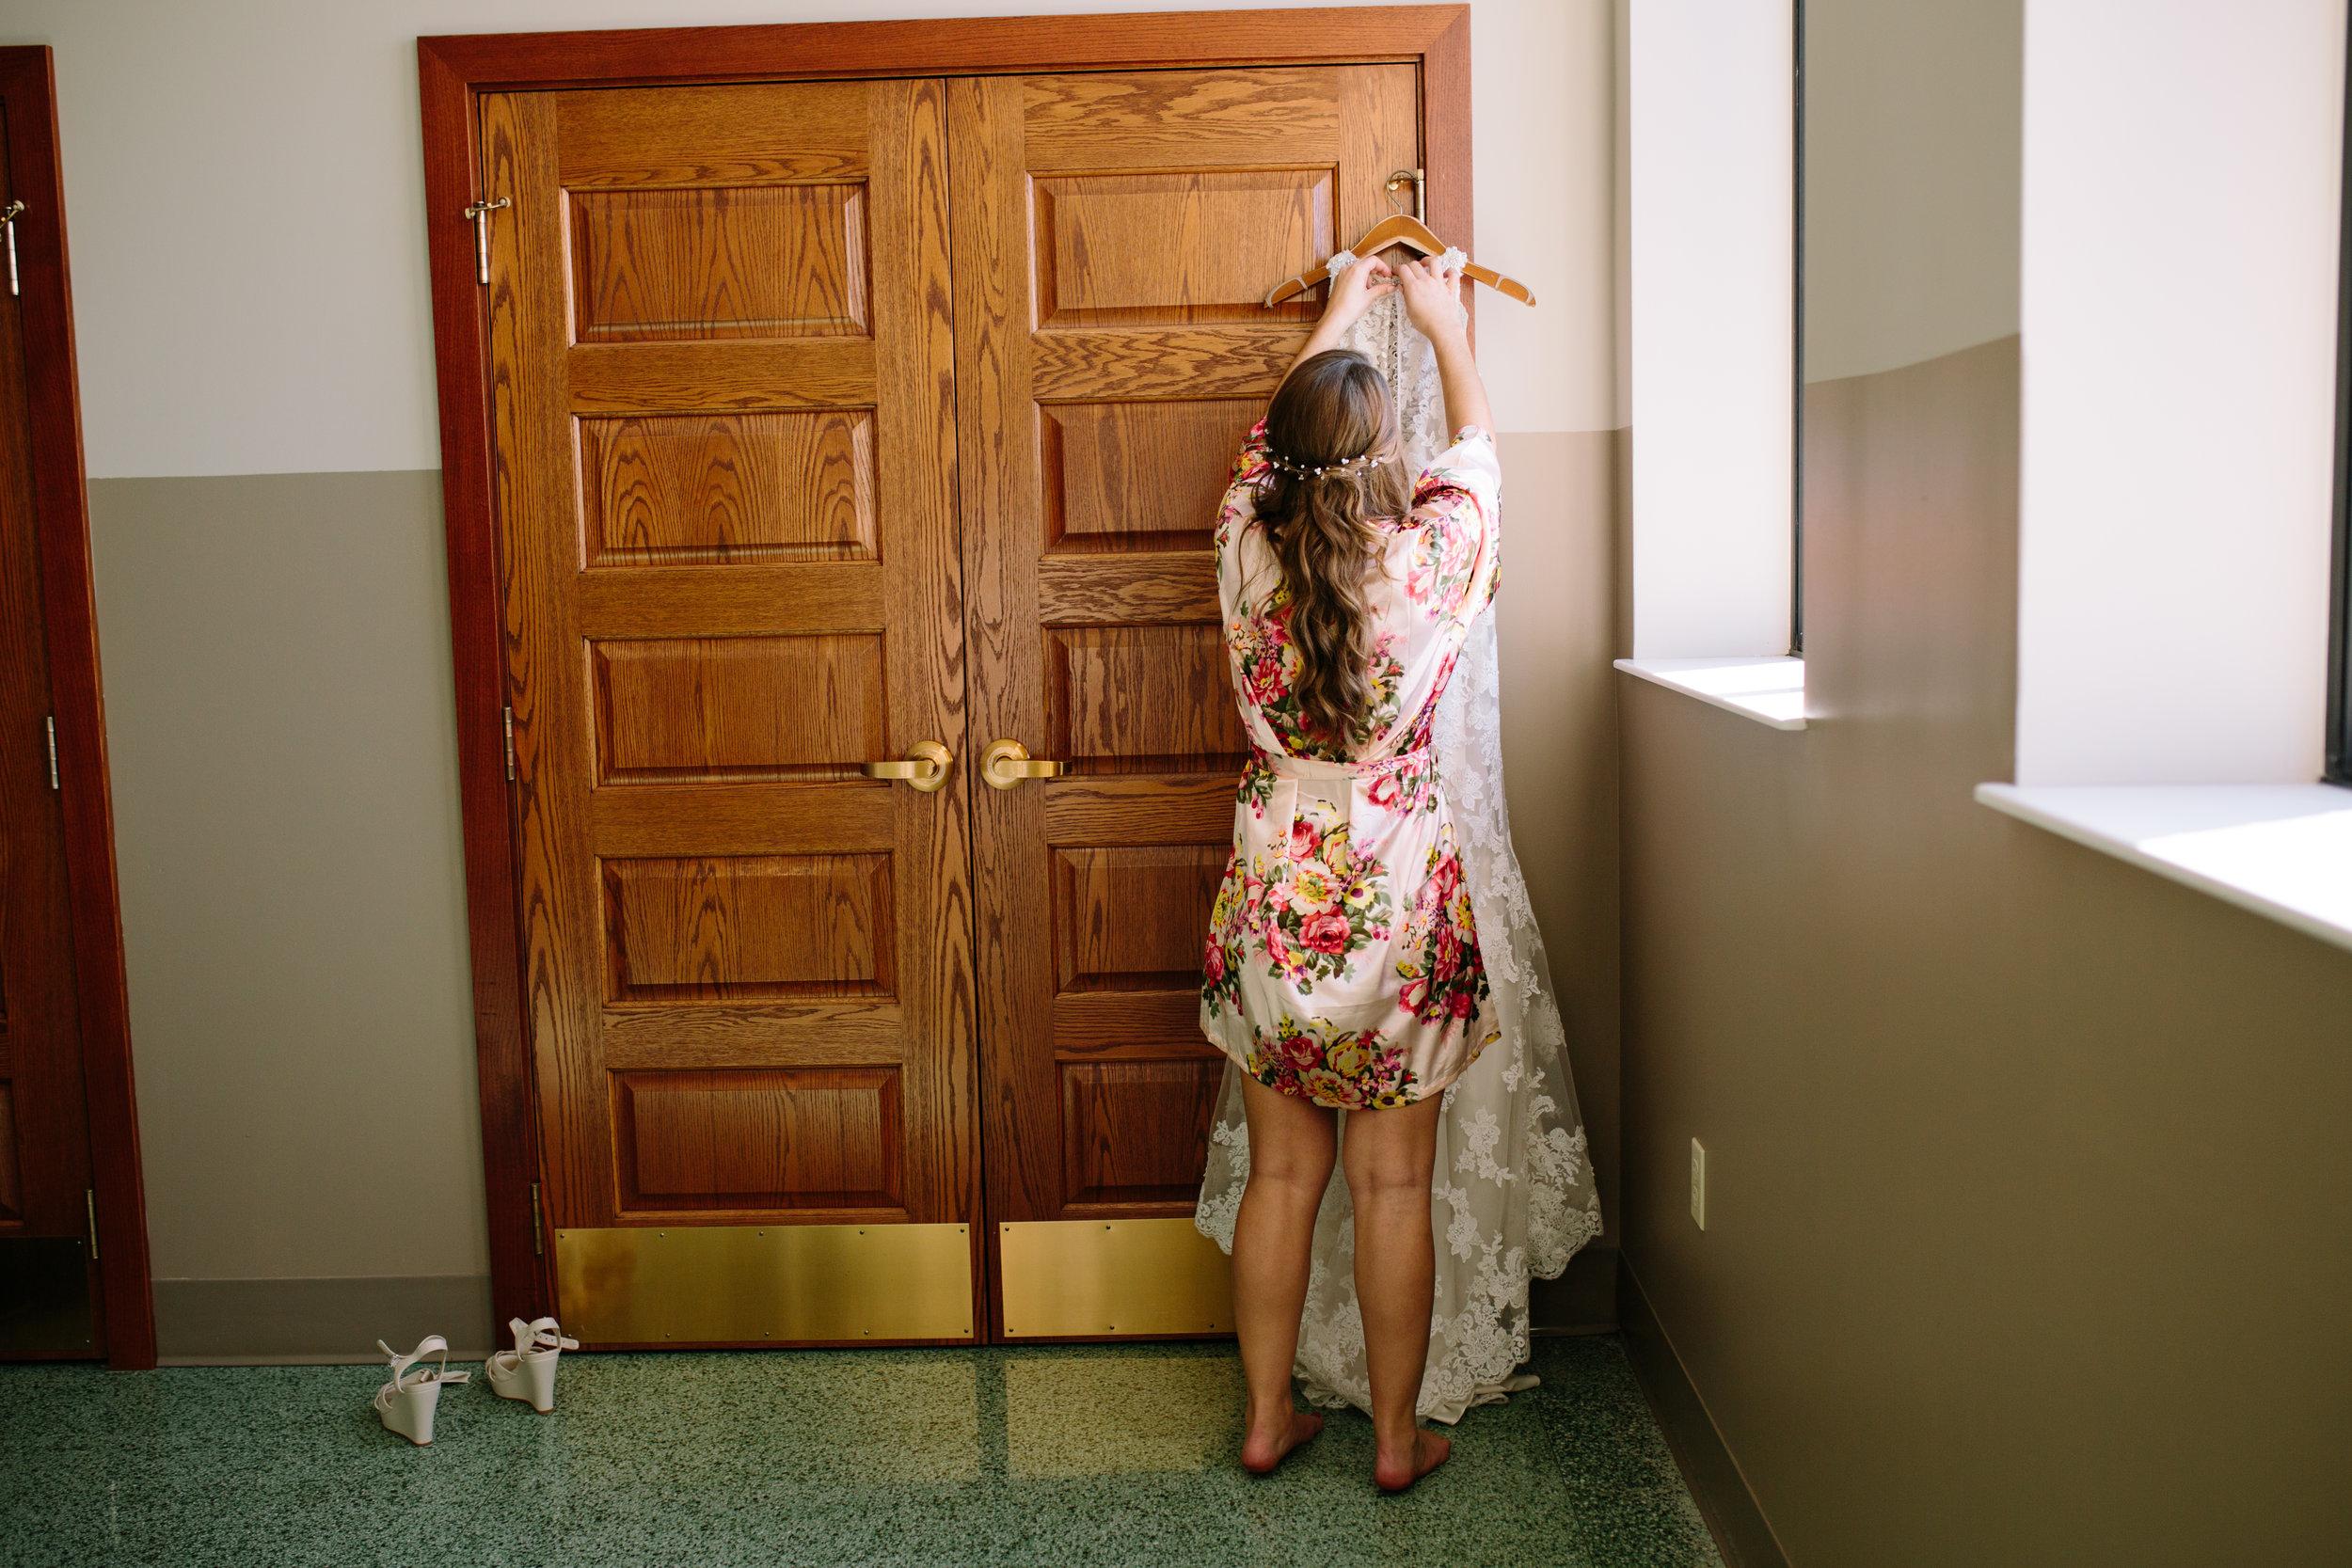 wedding.louisville.kentucky.wedding.photographer.nashville.LA.newyork_-11.jpg